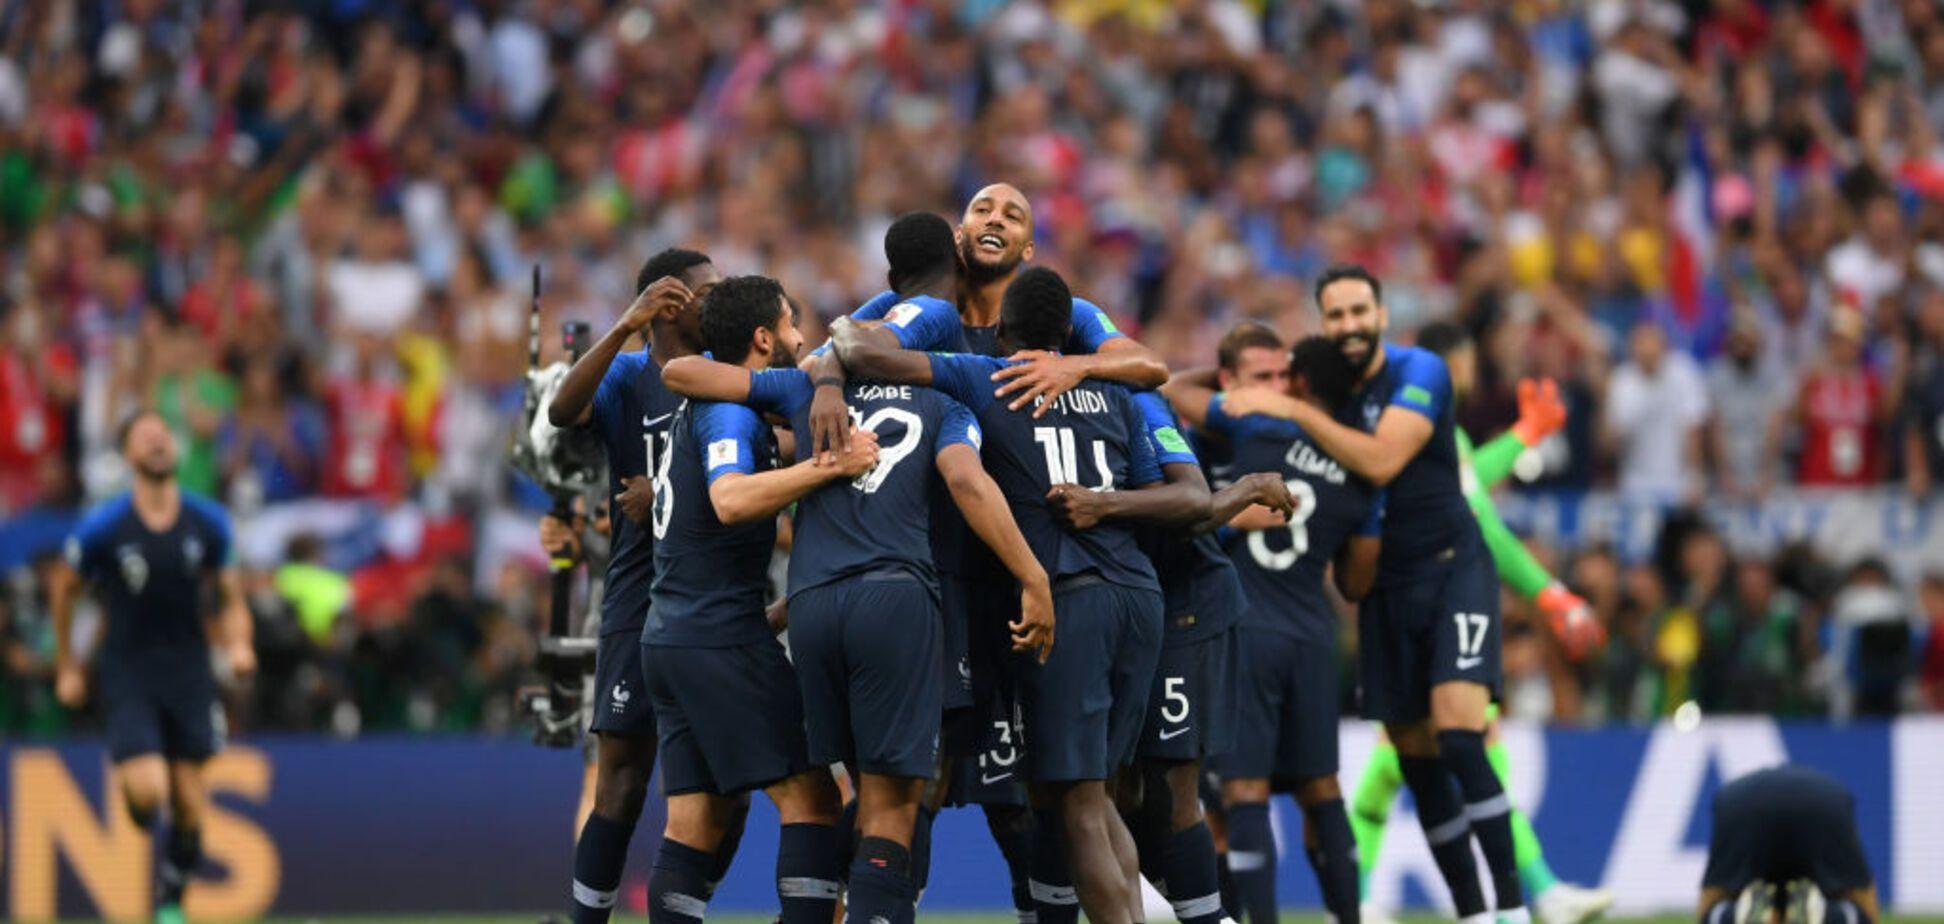 Франция - Хорватия: обзор финала ЧМ-2018